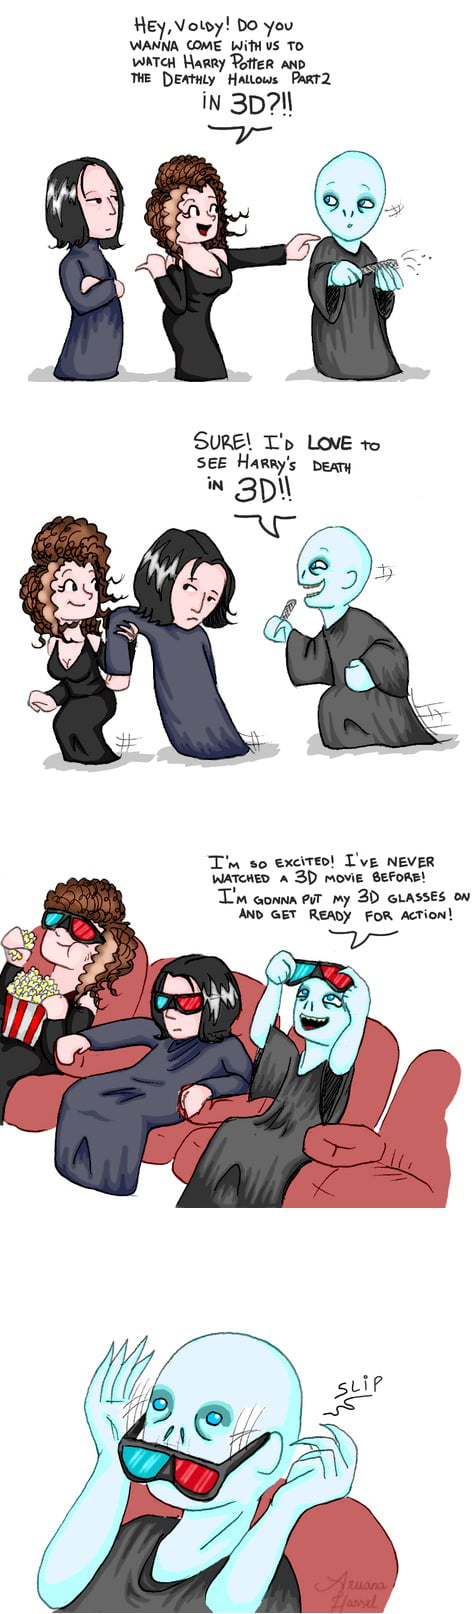 Scumbag Snape and Bellatrix